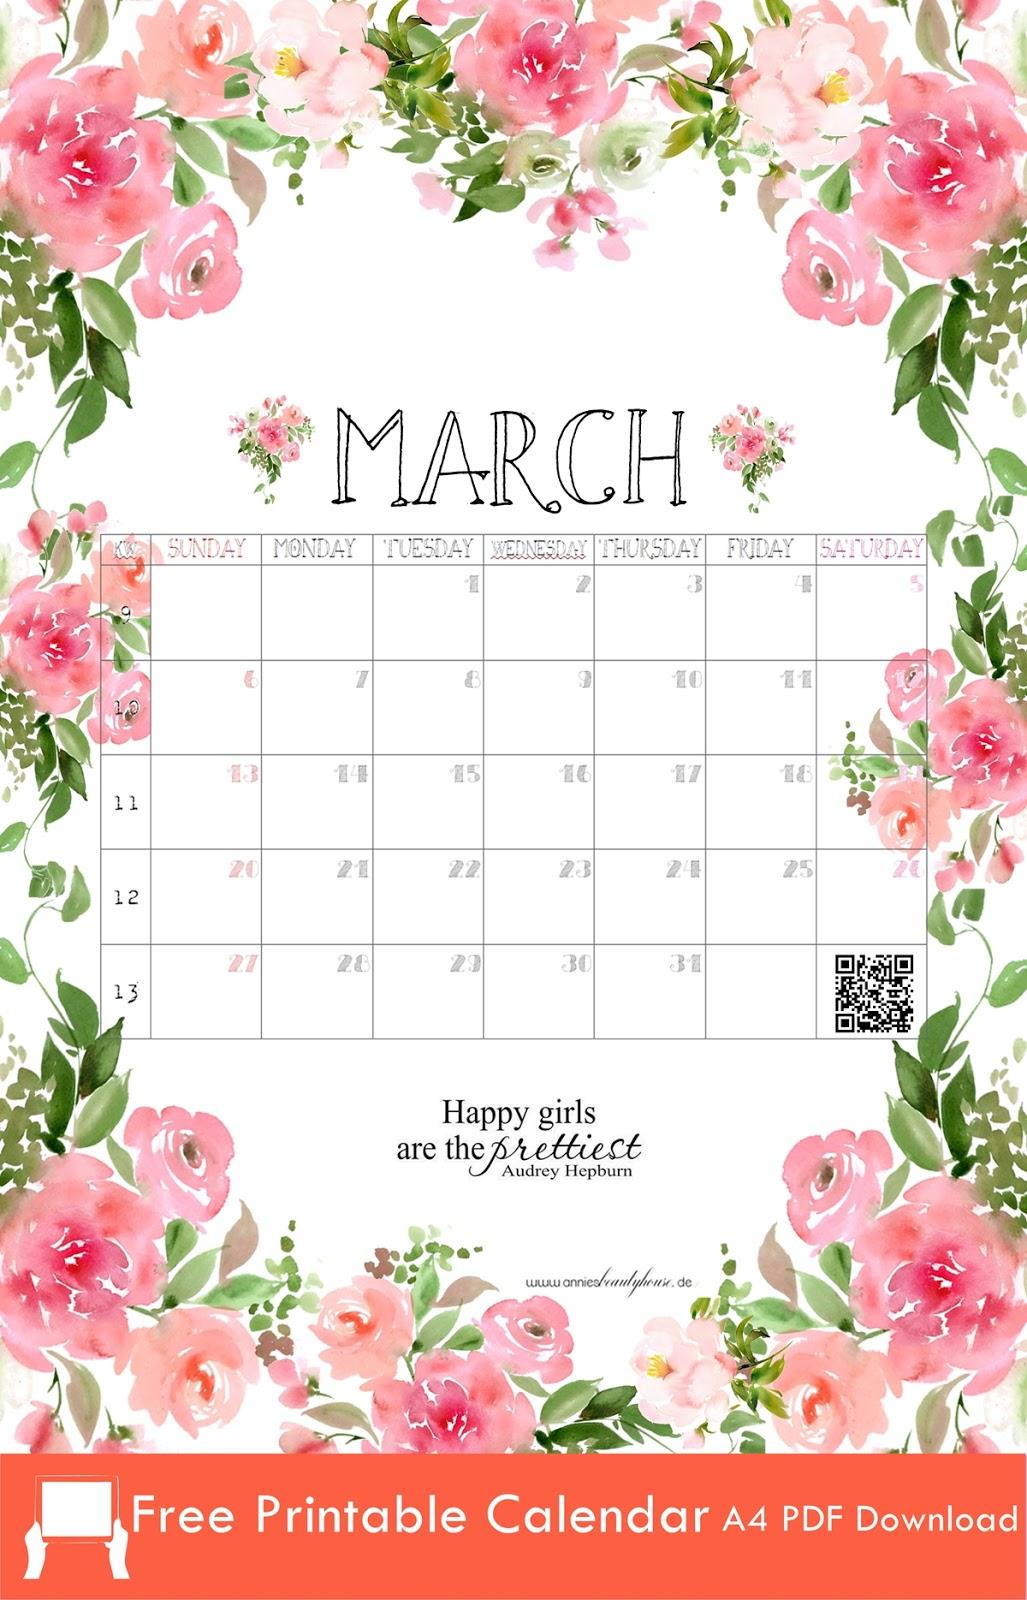 Printable Calendar March 2016 A4 PDF